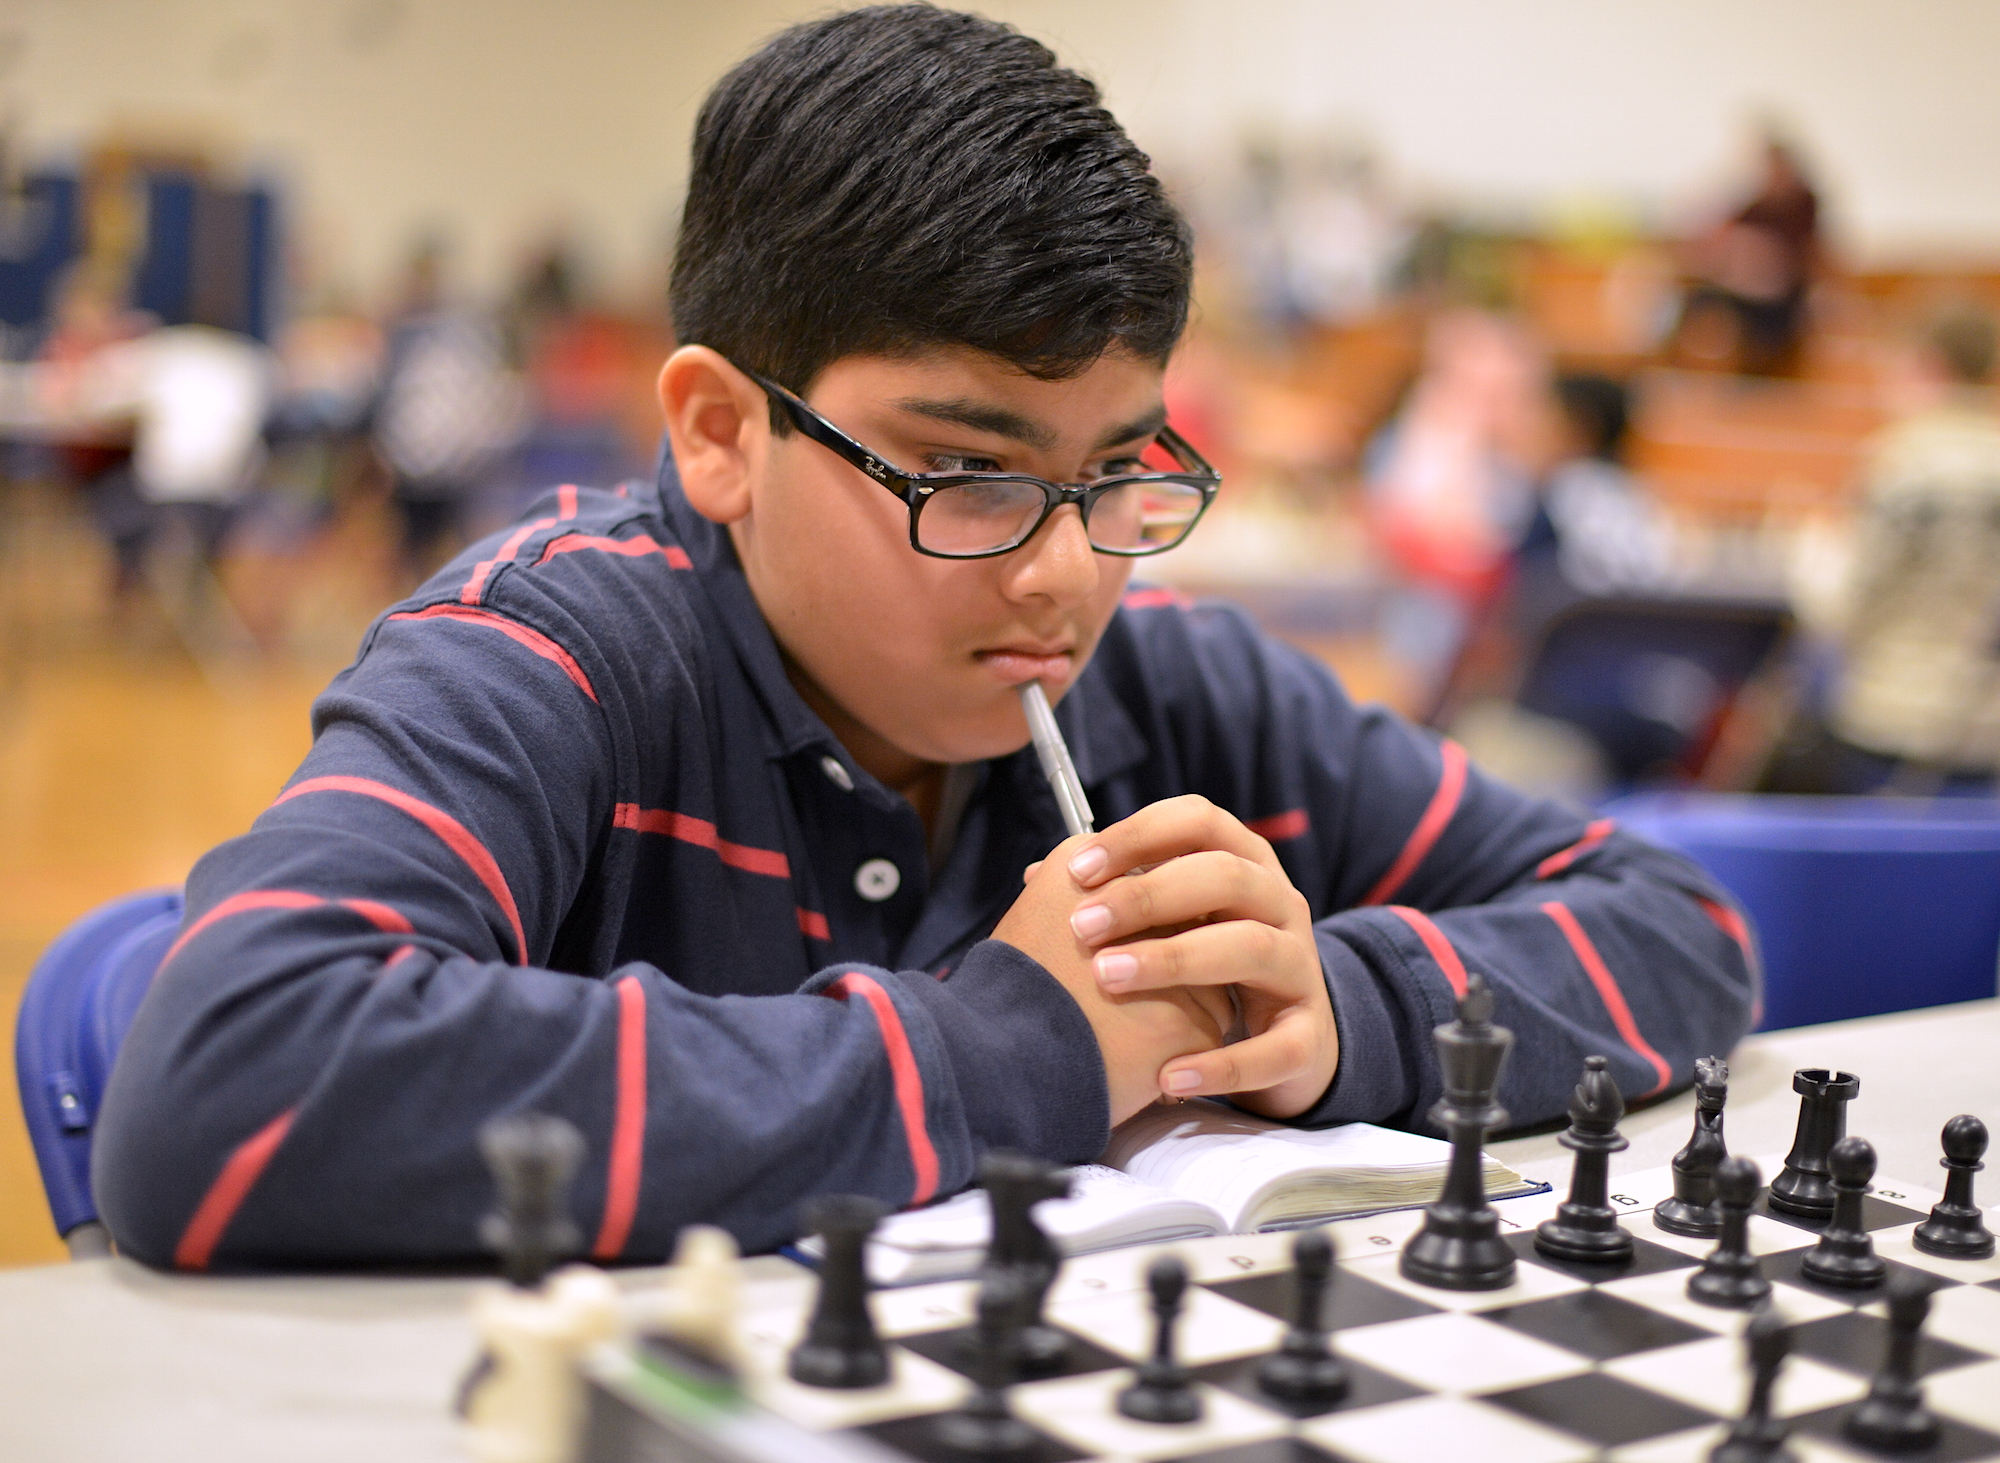 Garden School Chess Tournament June 5, 2016